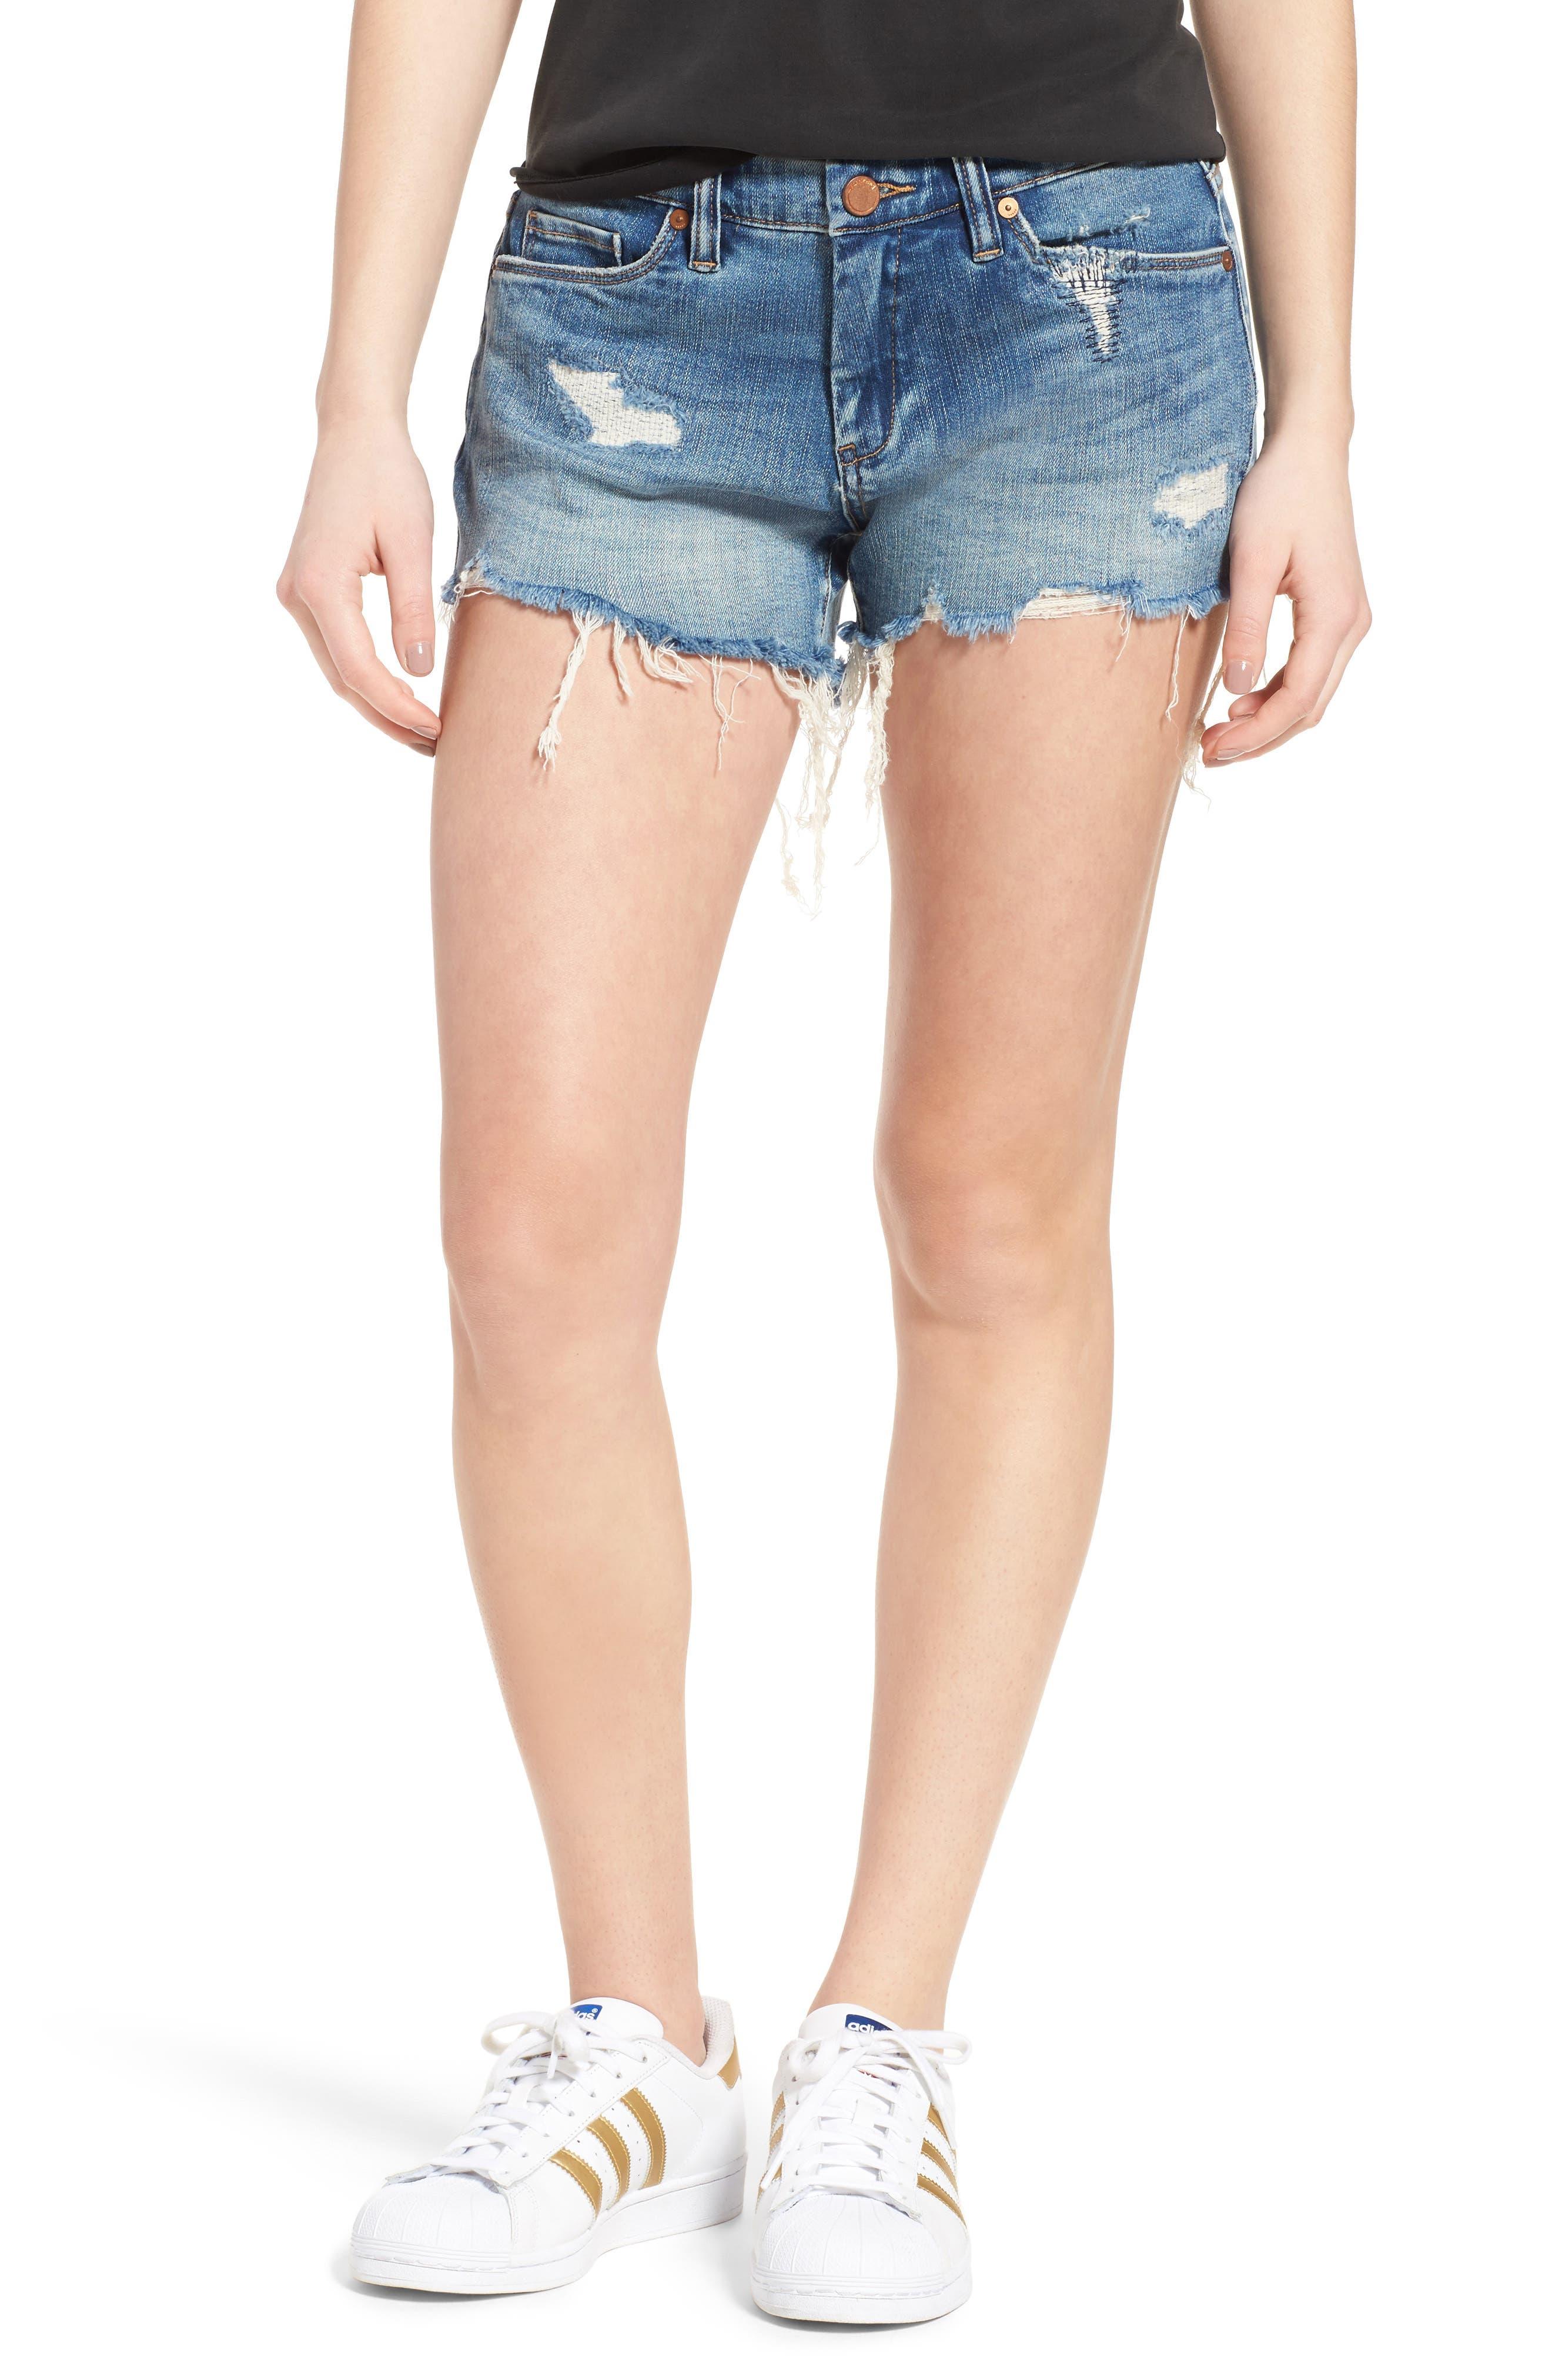 BLANKNYC Little Queenie Ripped Jean Shorts (Box Fresh)